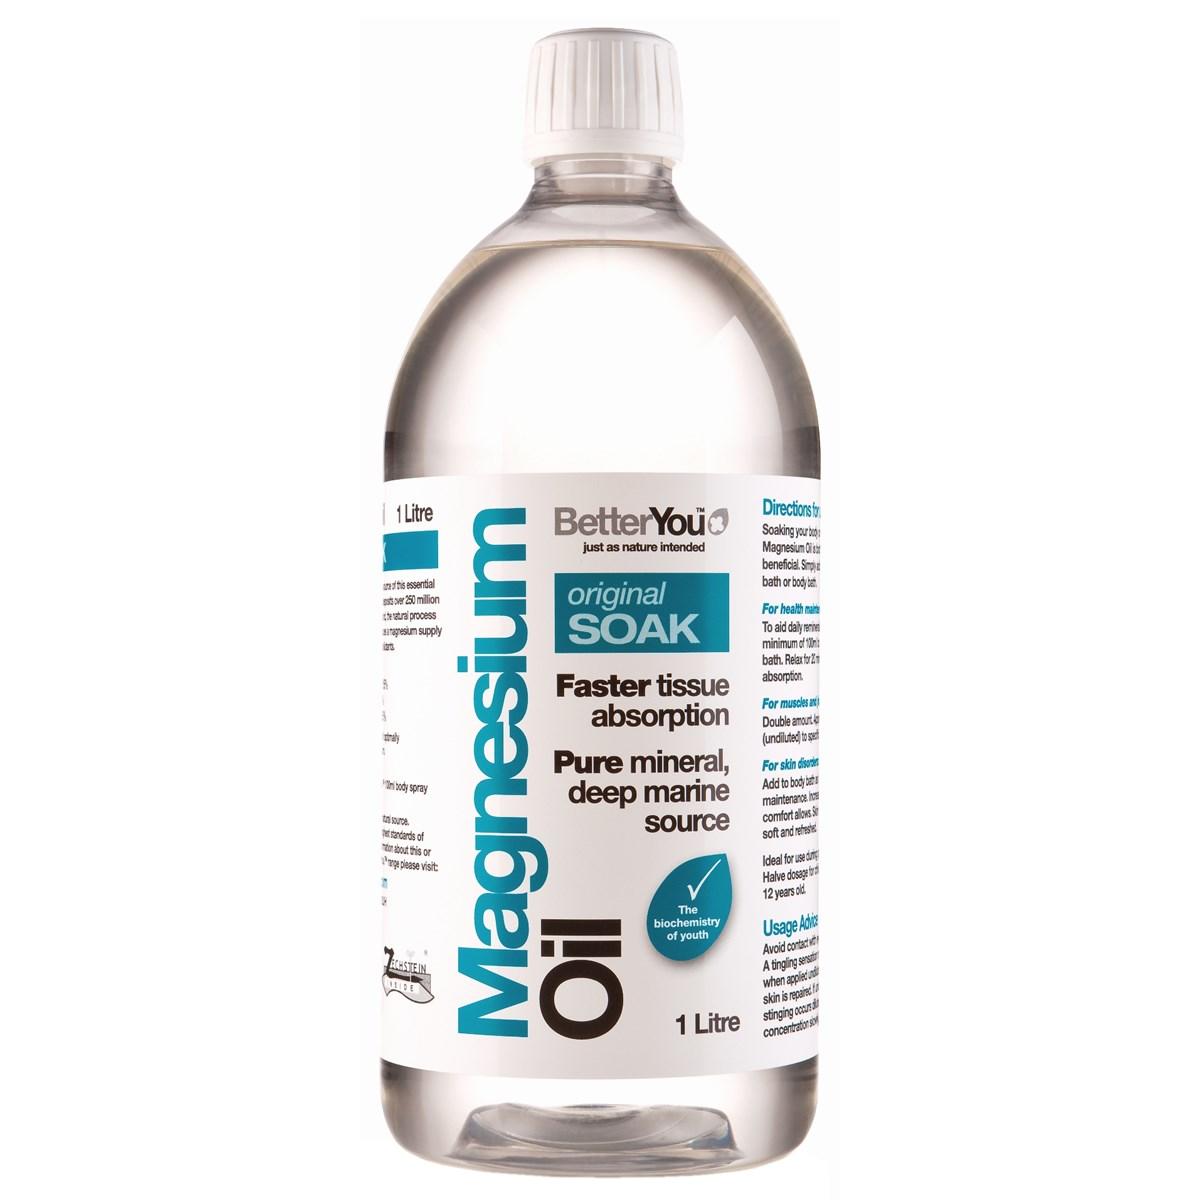 BetterYou Magnesium Oil Original Soak - 1 Litre